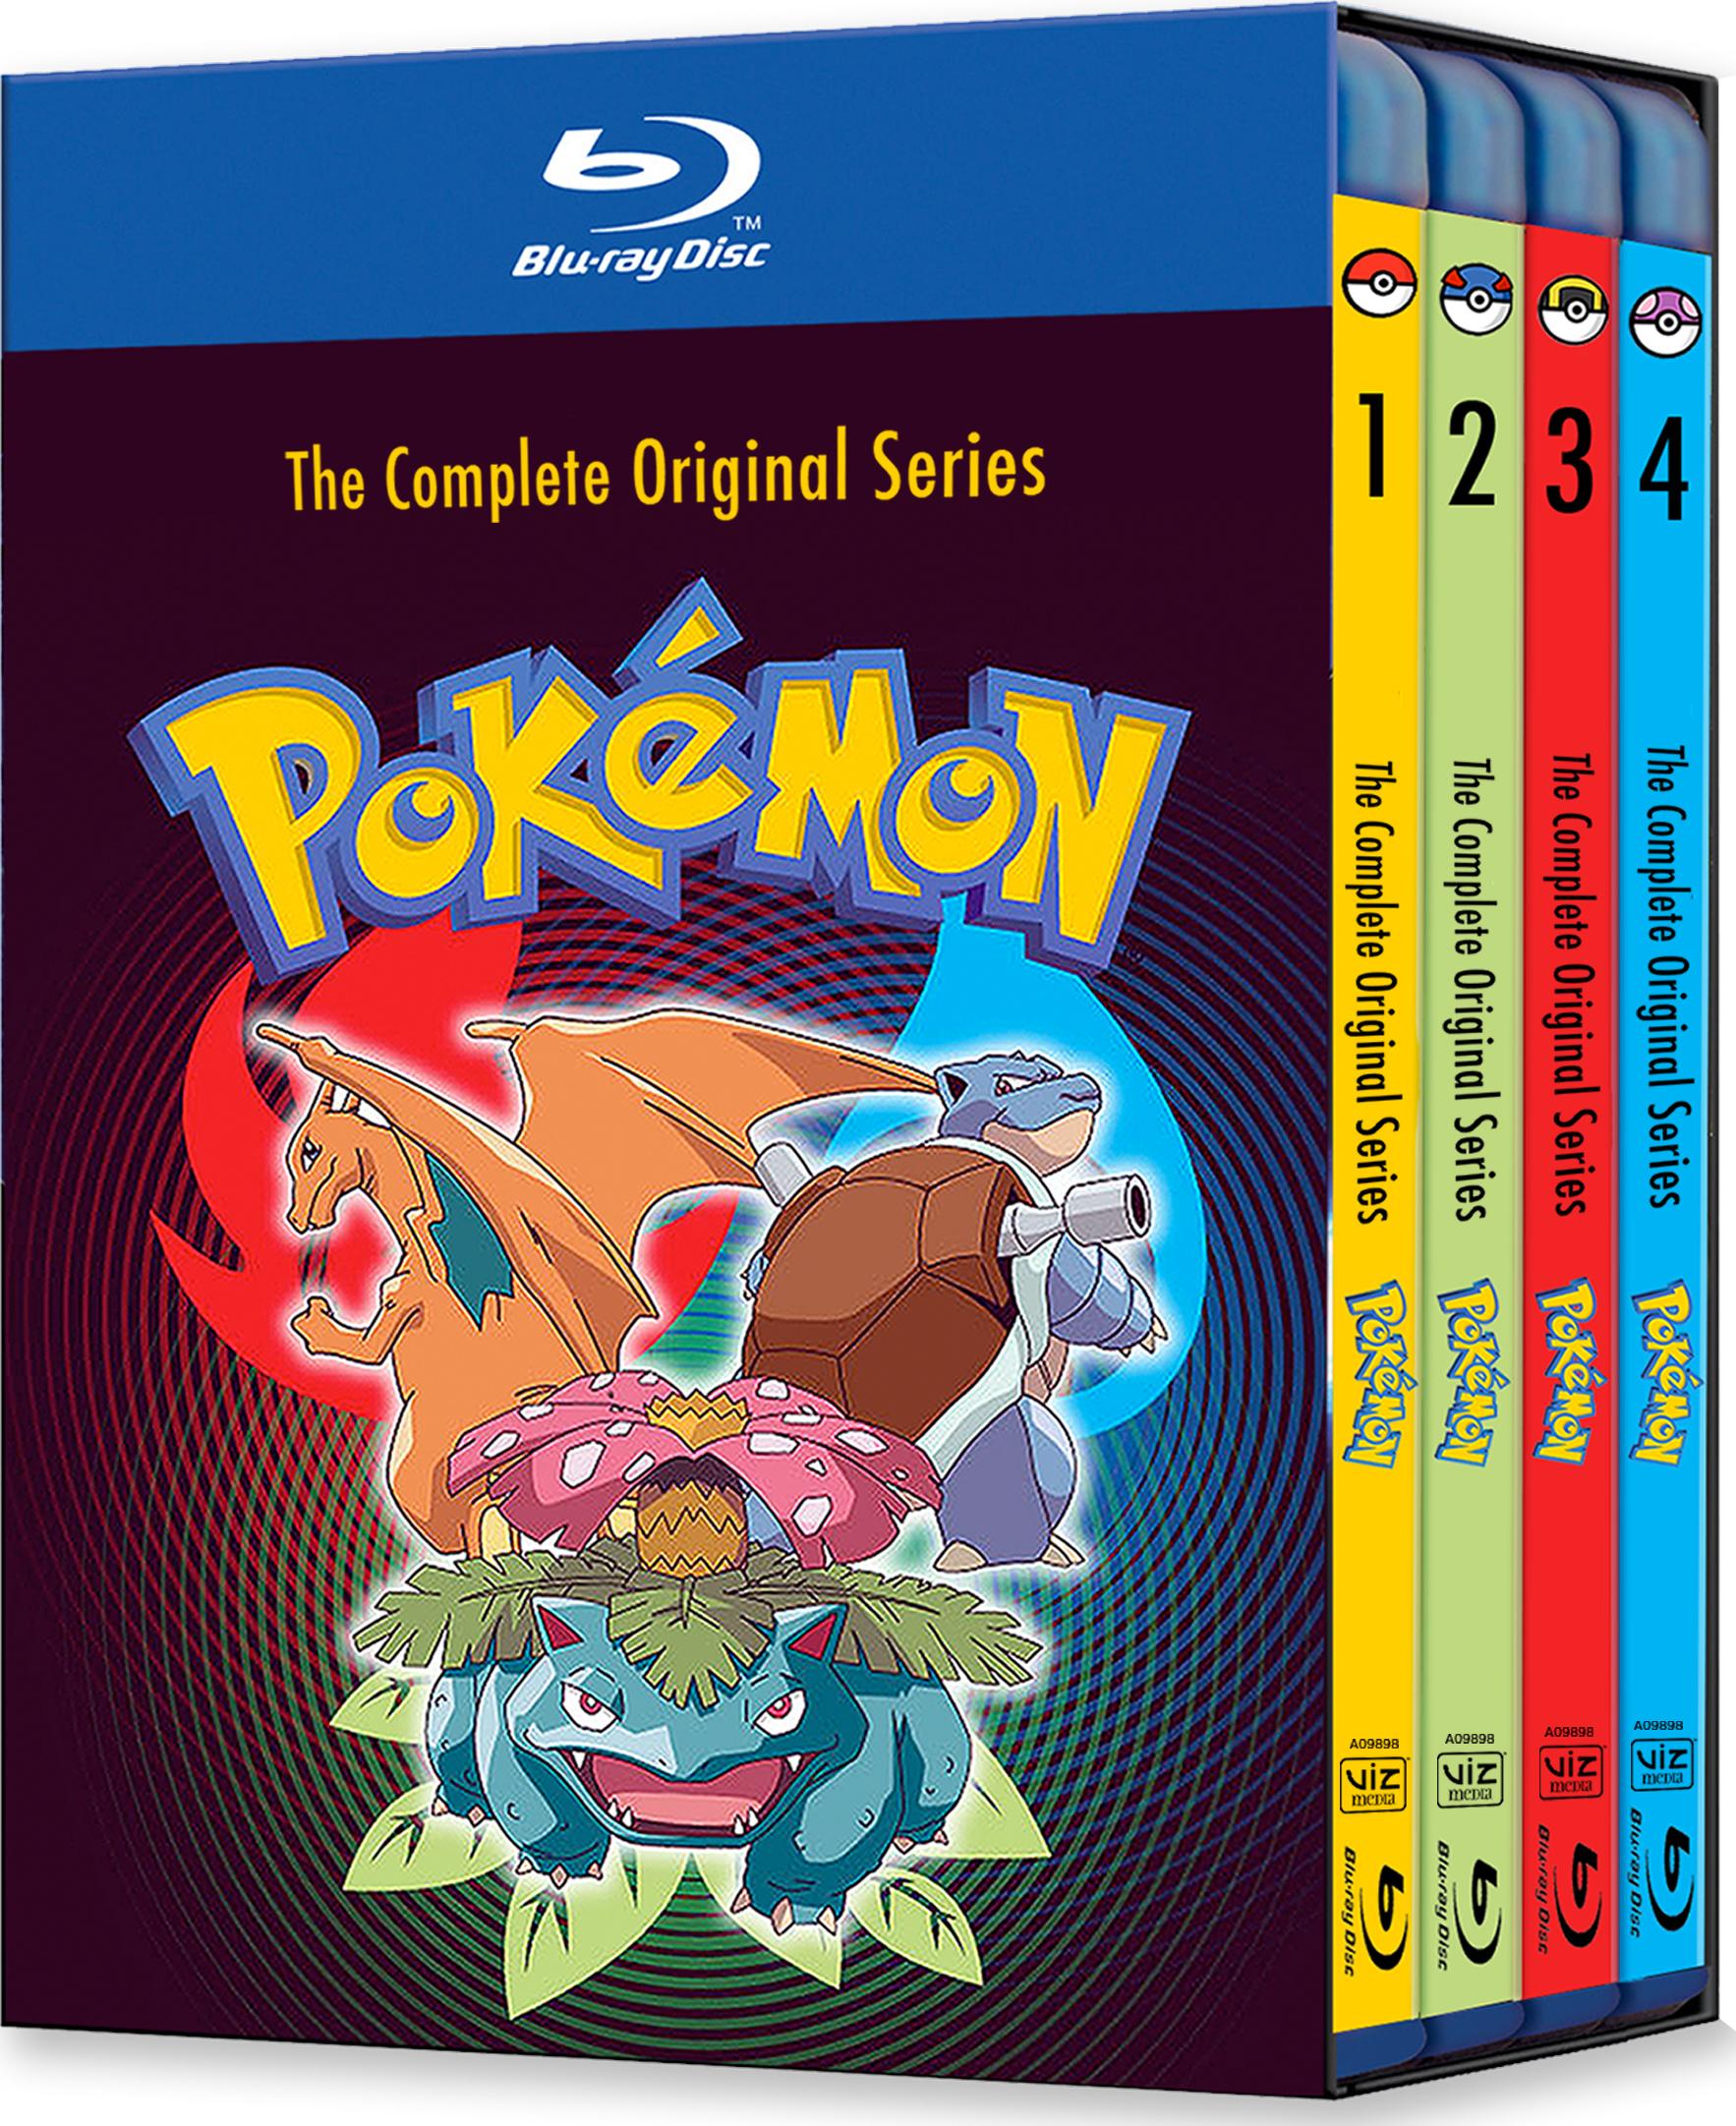 pokemon: the complete original series blu-ray